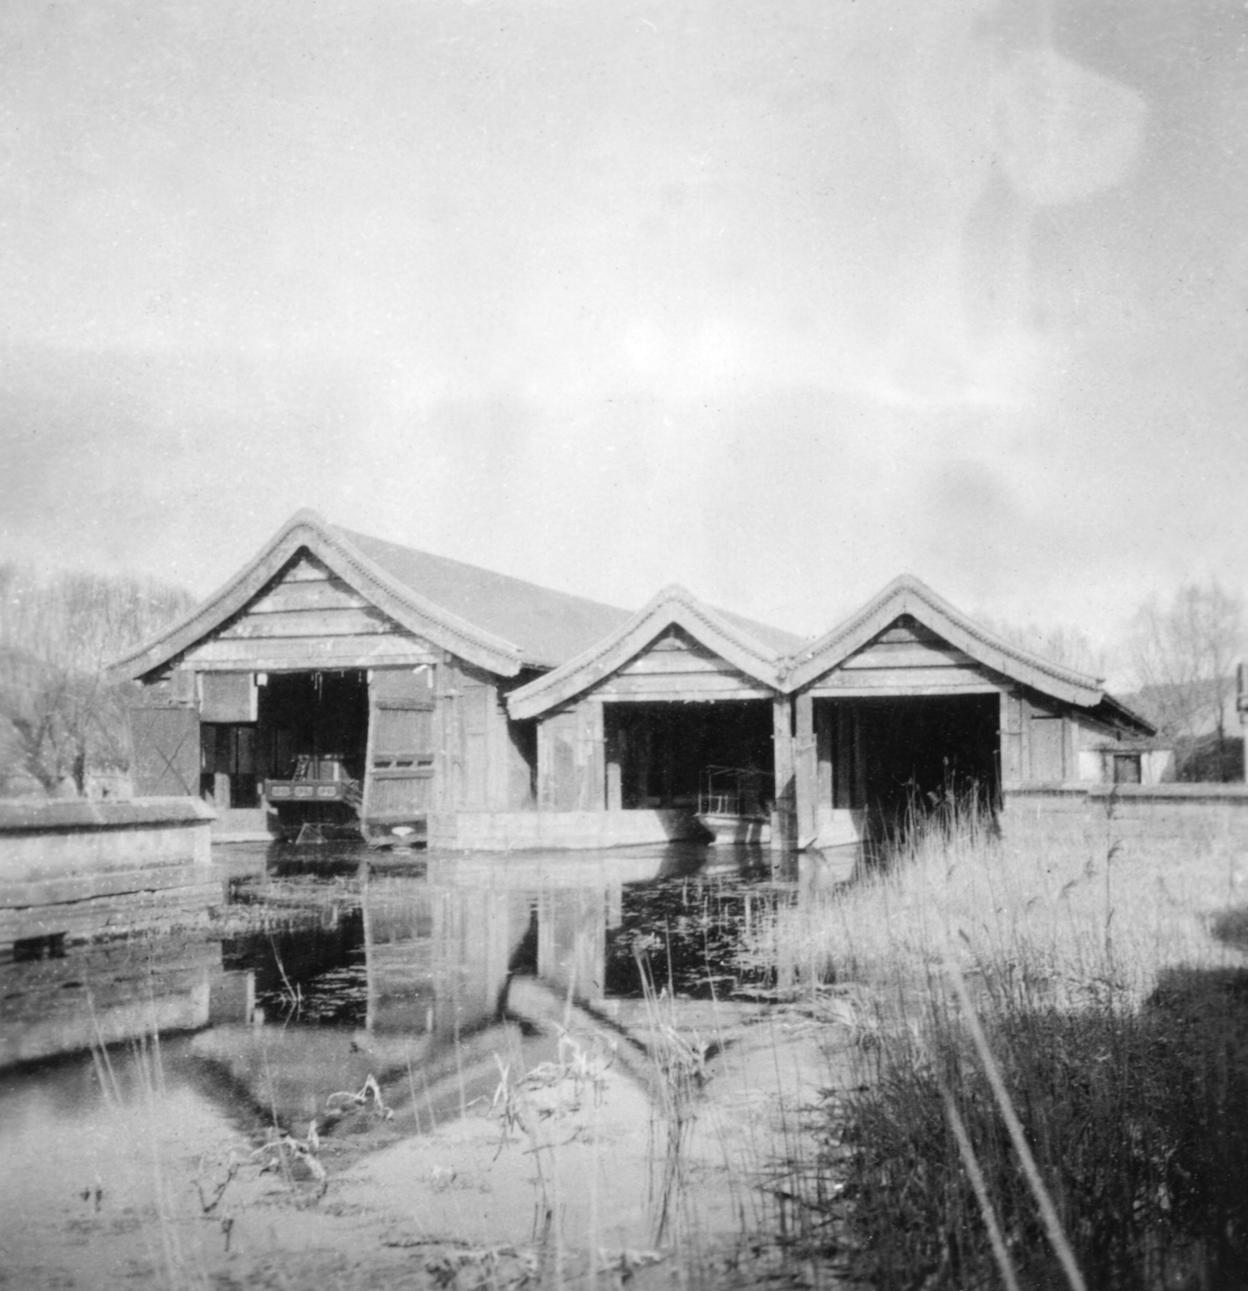 Yihe Yuan Chuan Wu (Boathouses in the Summer Palace) 頤和園船屋.